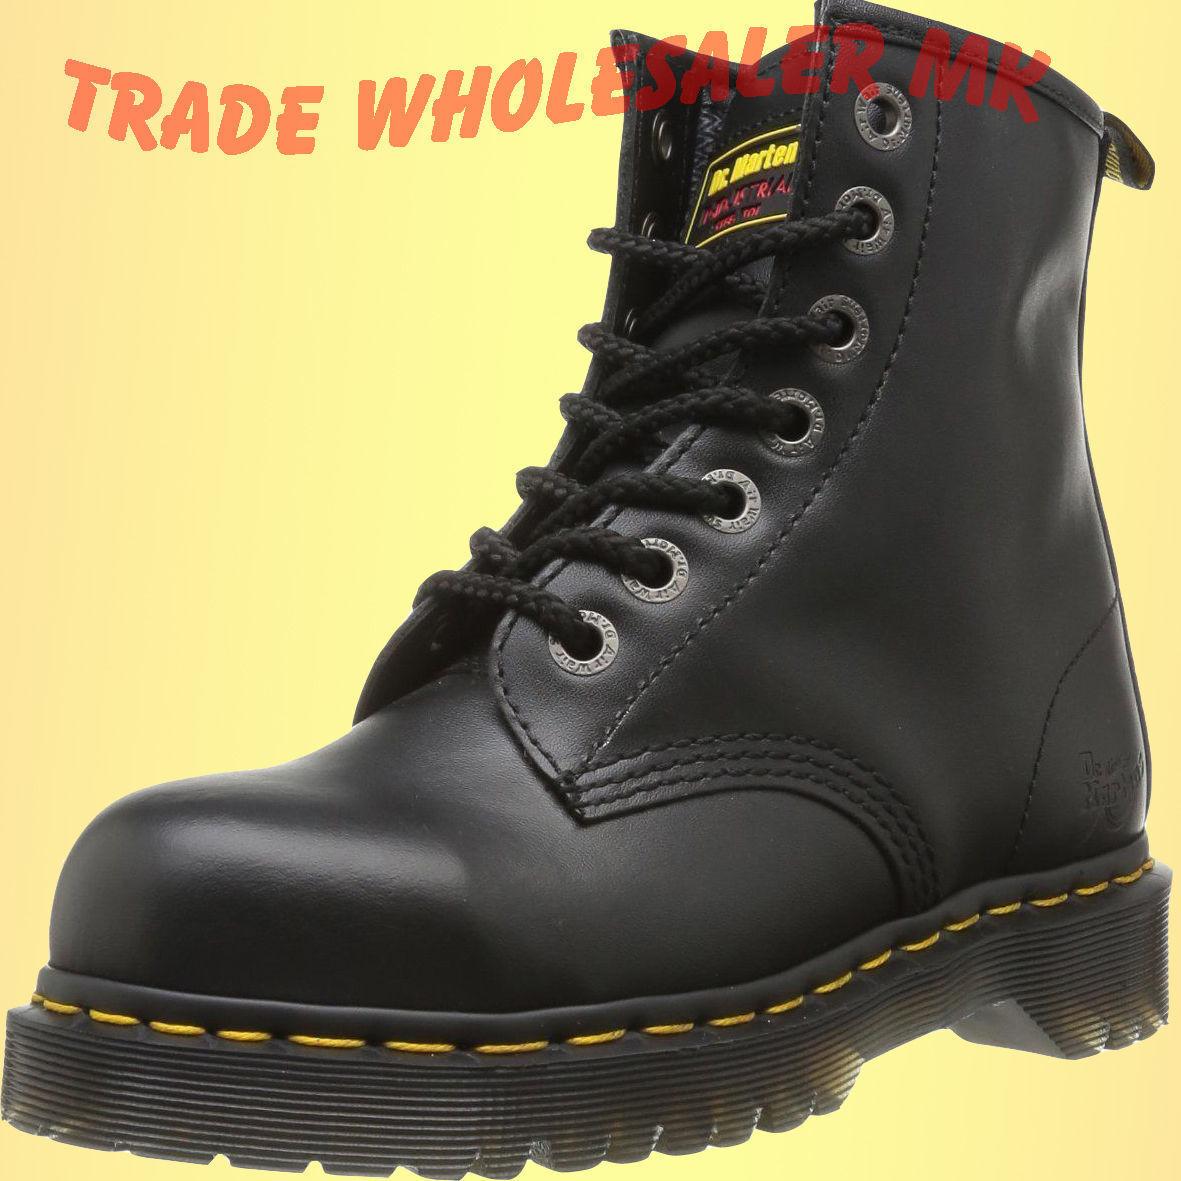 a461f7fc45c Details about DM Docs Dr Martens Icon 7 Eyelet Steel ToeCap Safety Boots UK  3-13 Work Uniform